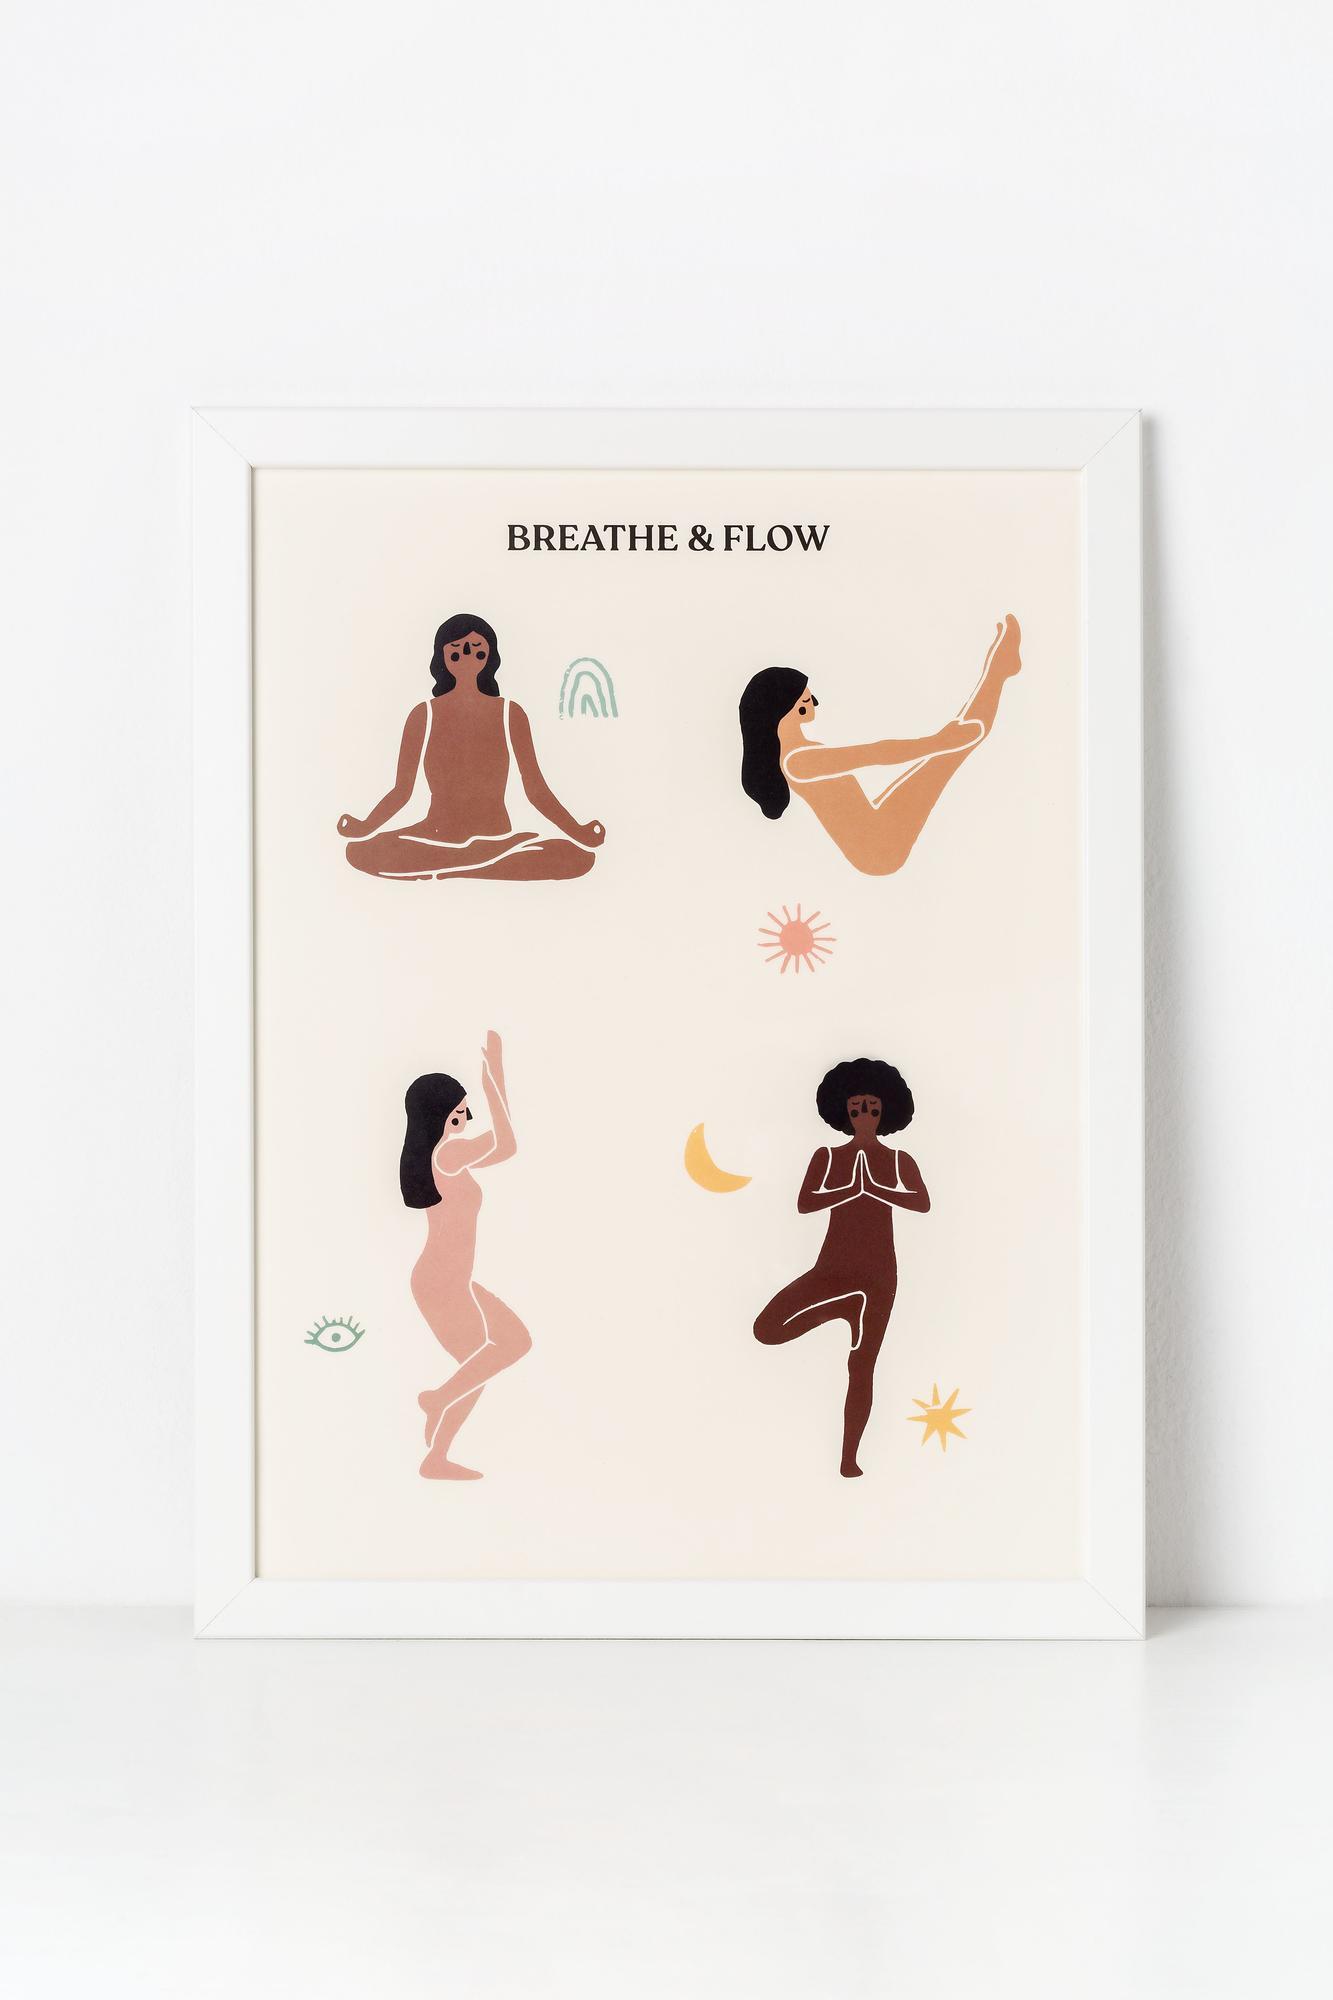 Joga Breathe&Flow - Asana Creatives | JestemSlow.pl